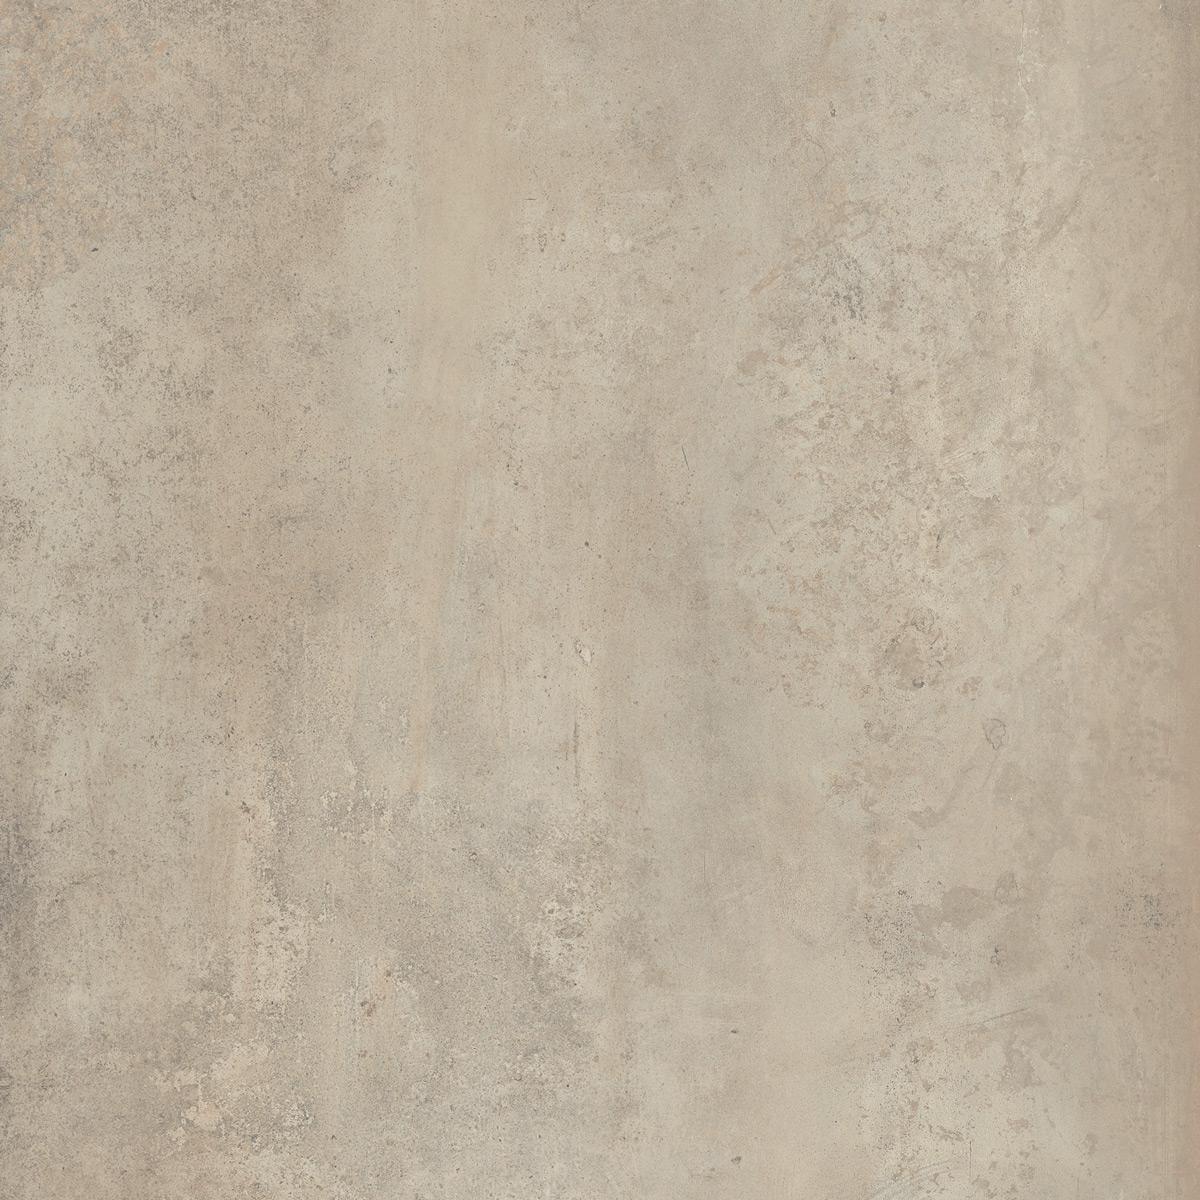 Castelvetro Materika Terrassenplatte Grigio 100x100 MATT